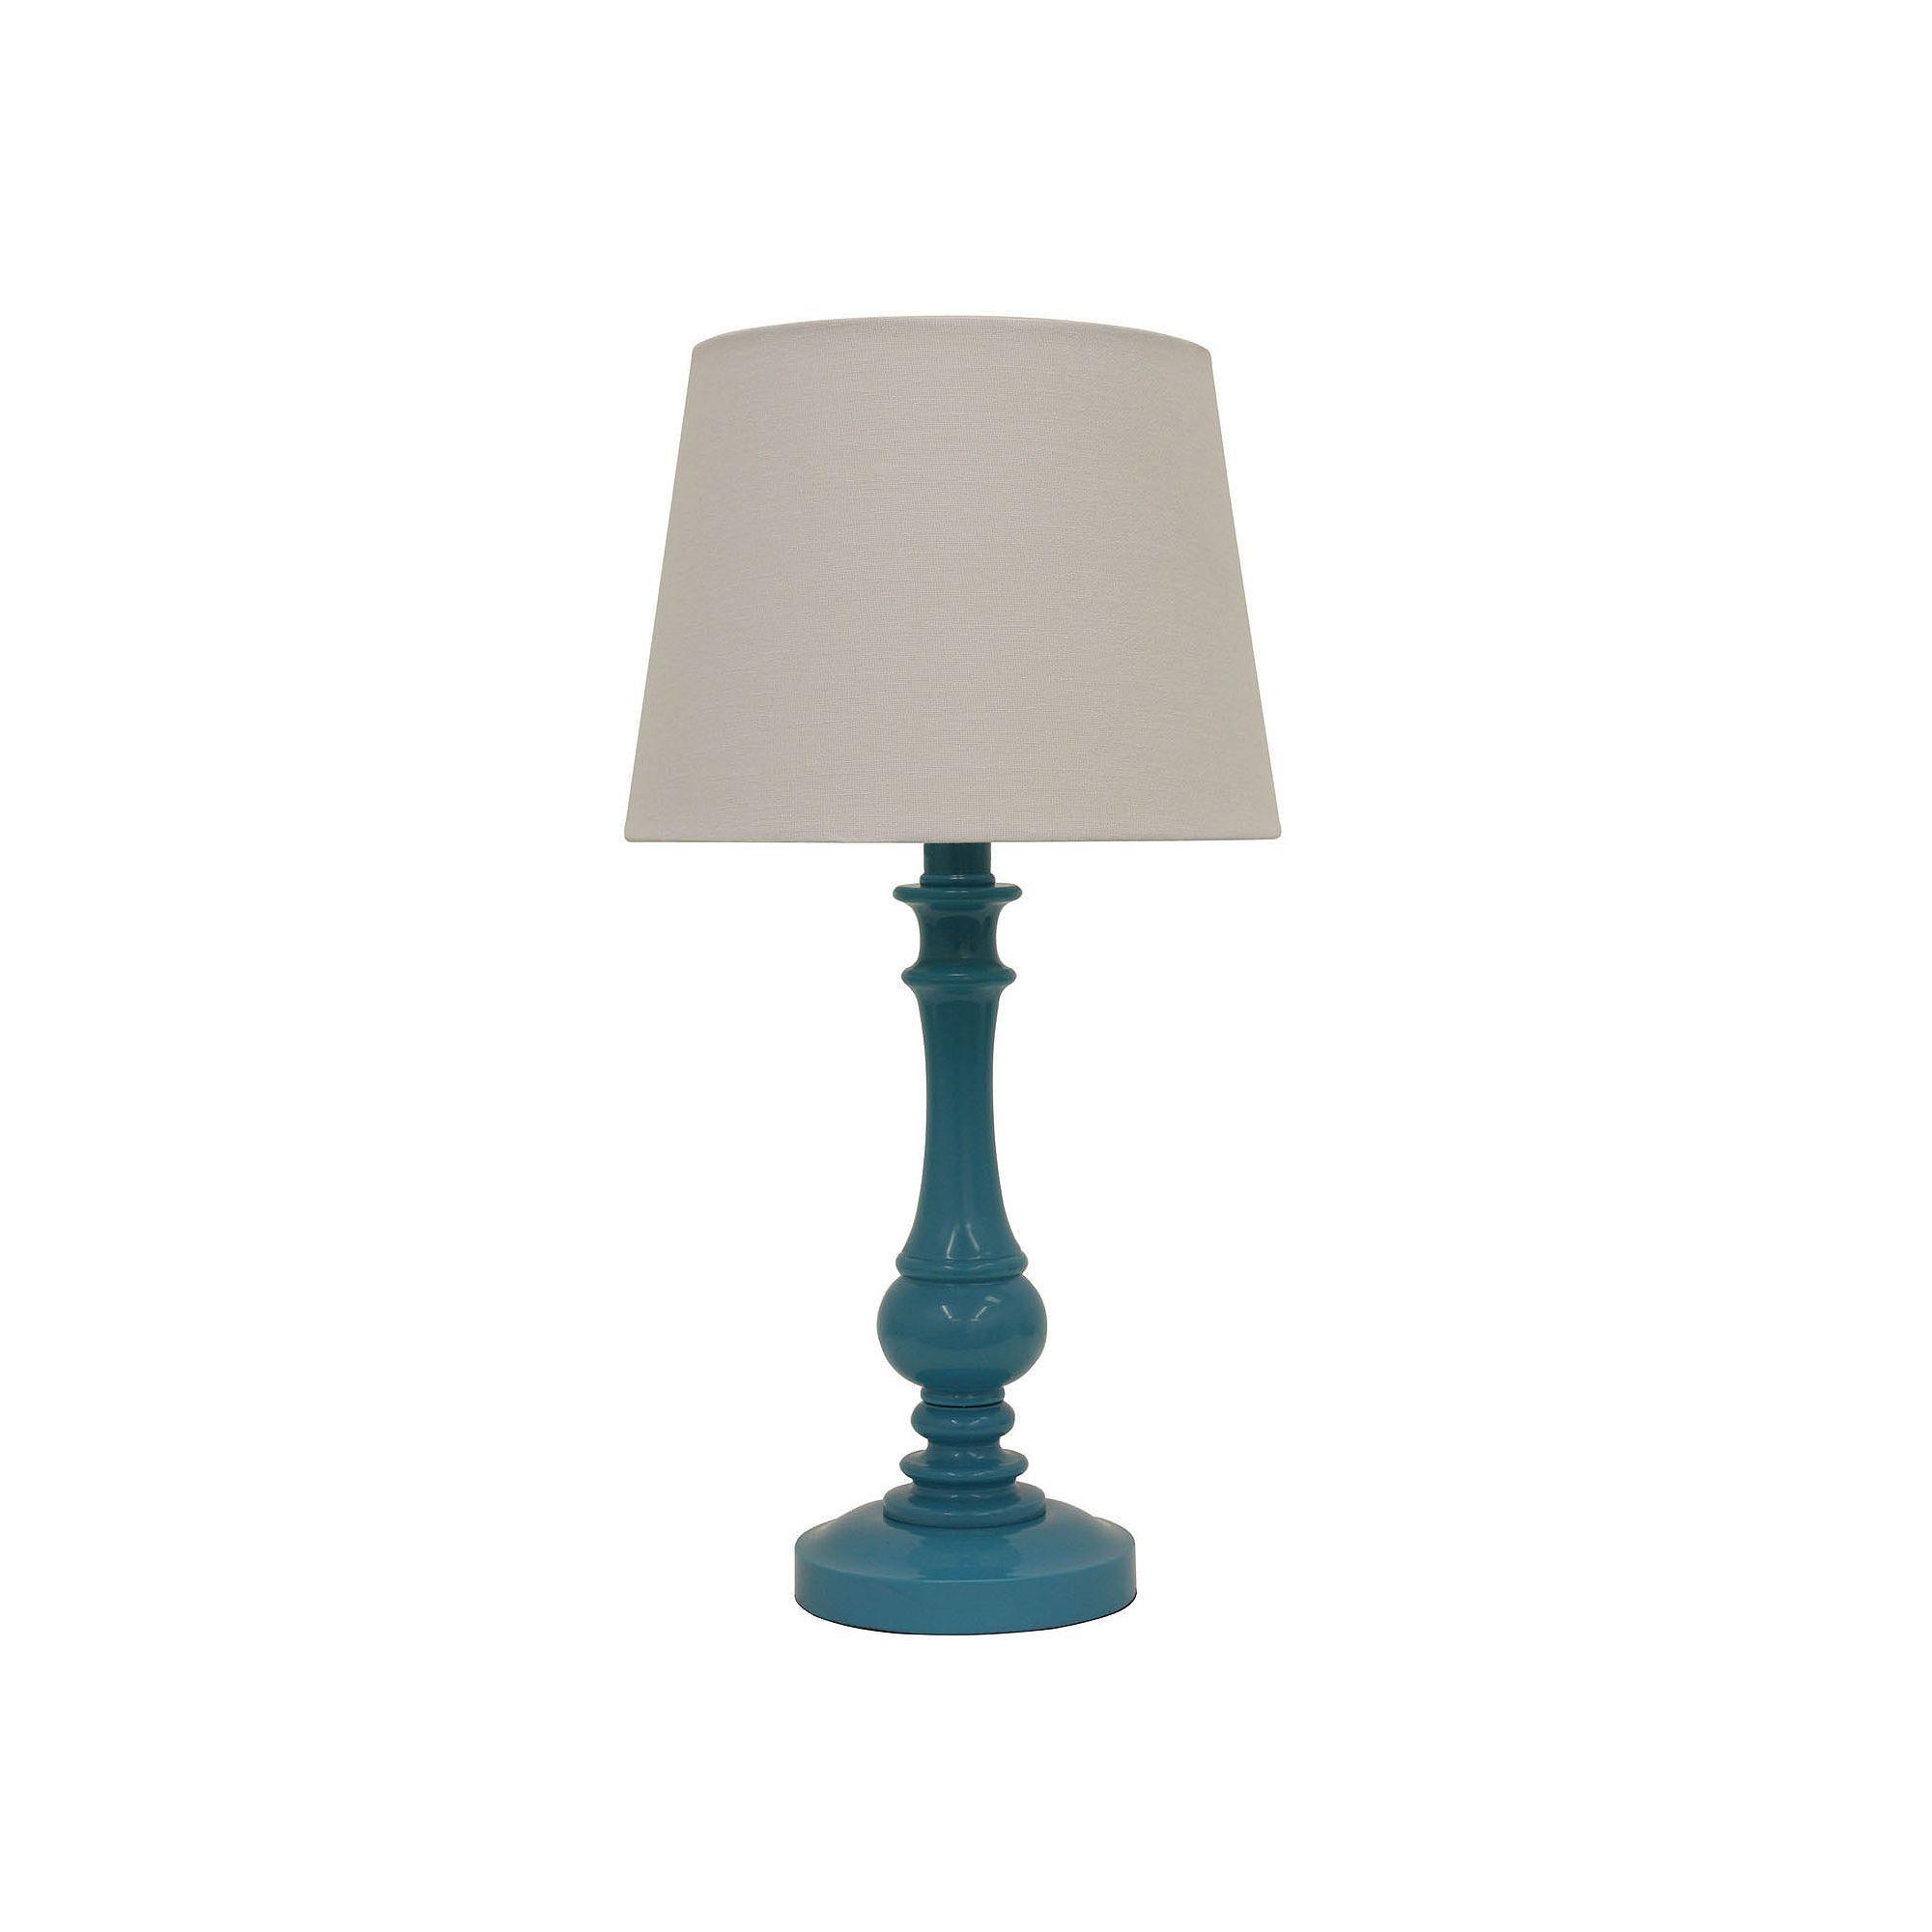 velecio eustis uk shade shades lamp aqua tables photo table australia fillable on blue appealing glass ta fascinating teal base clear lamps